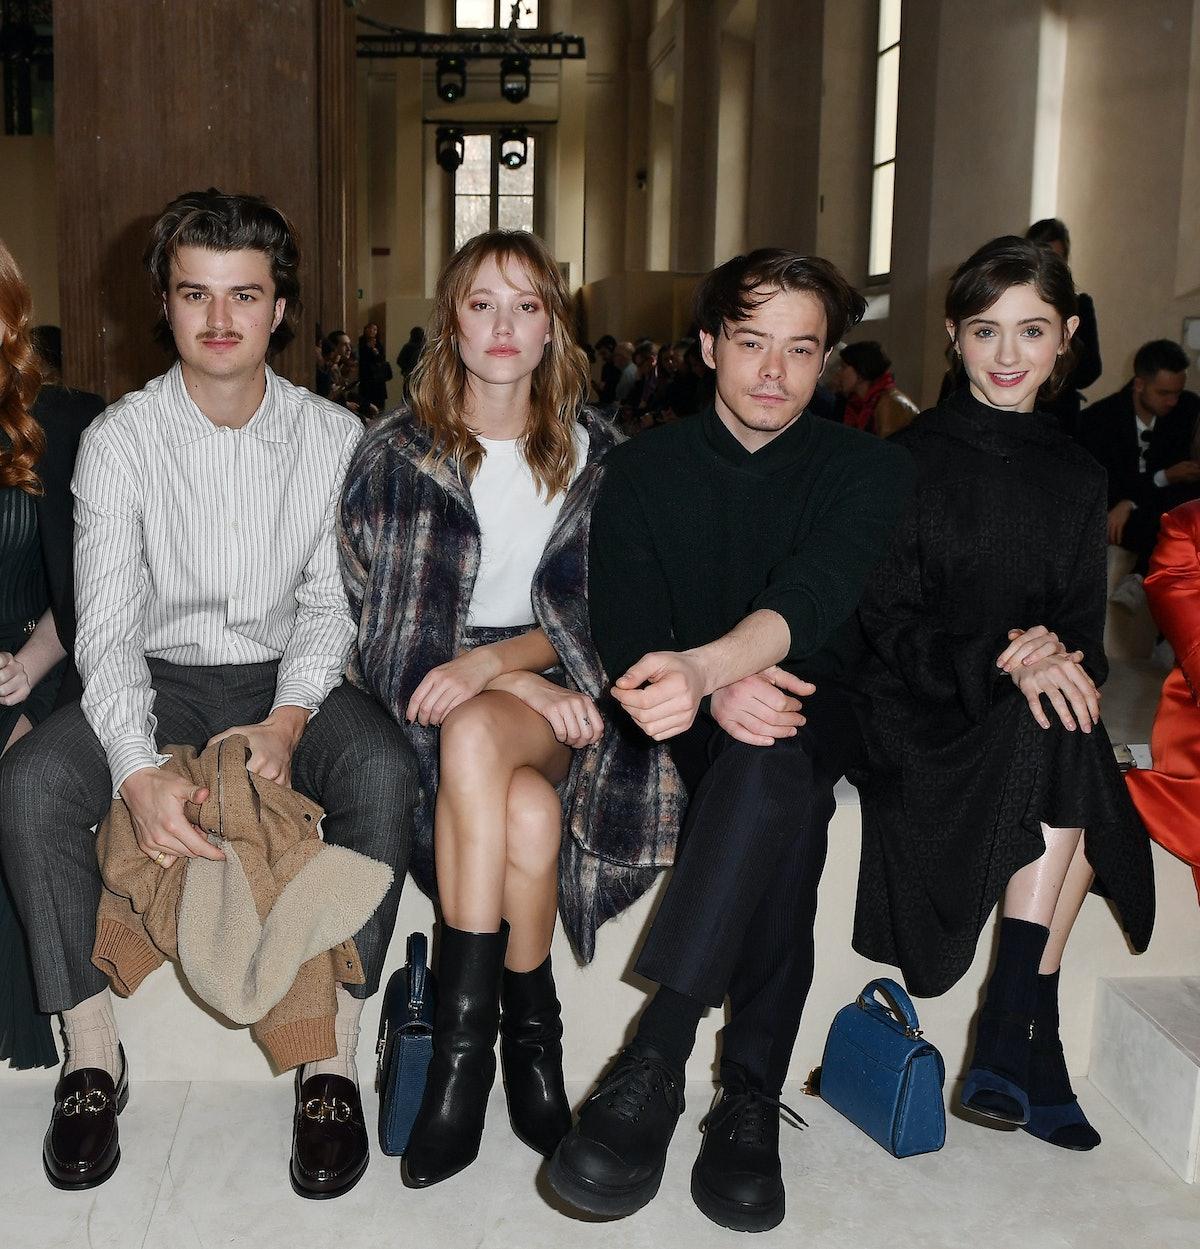 Salvatore Ferragamo - Front Row: Milan Fashion Week Autumn/Winter 2019/20